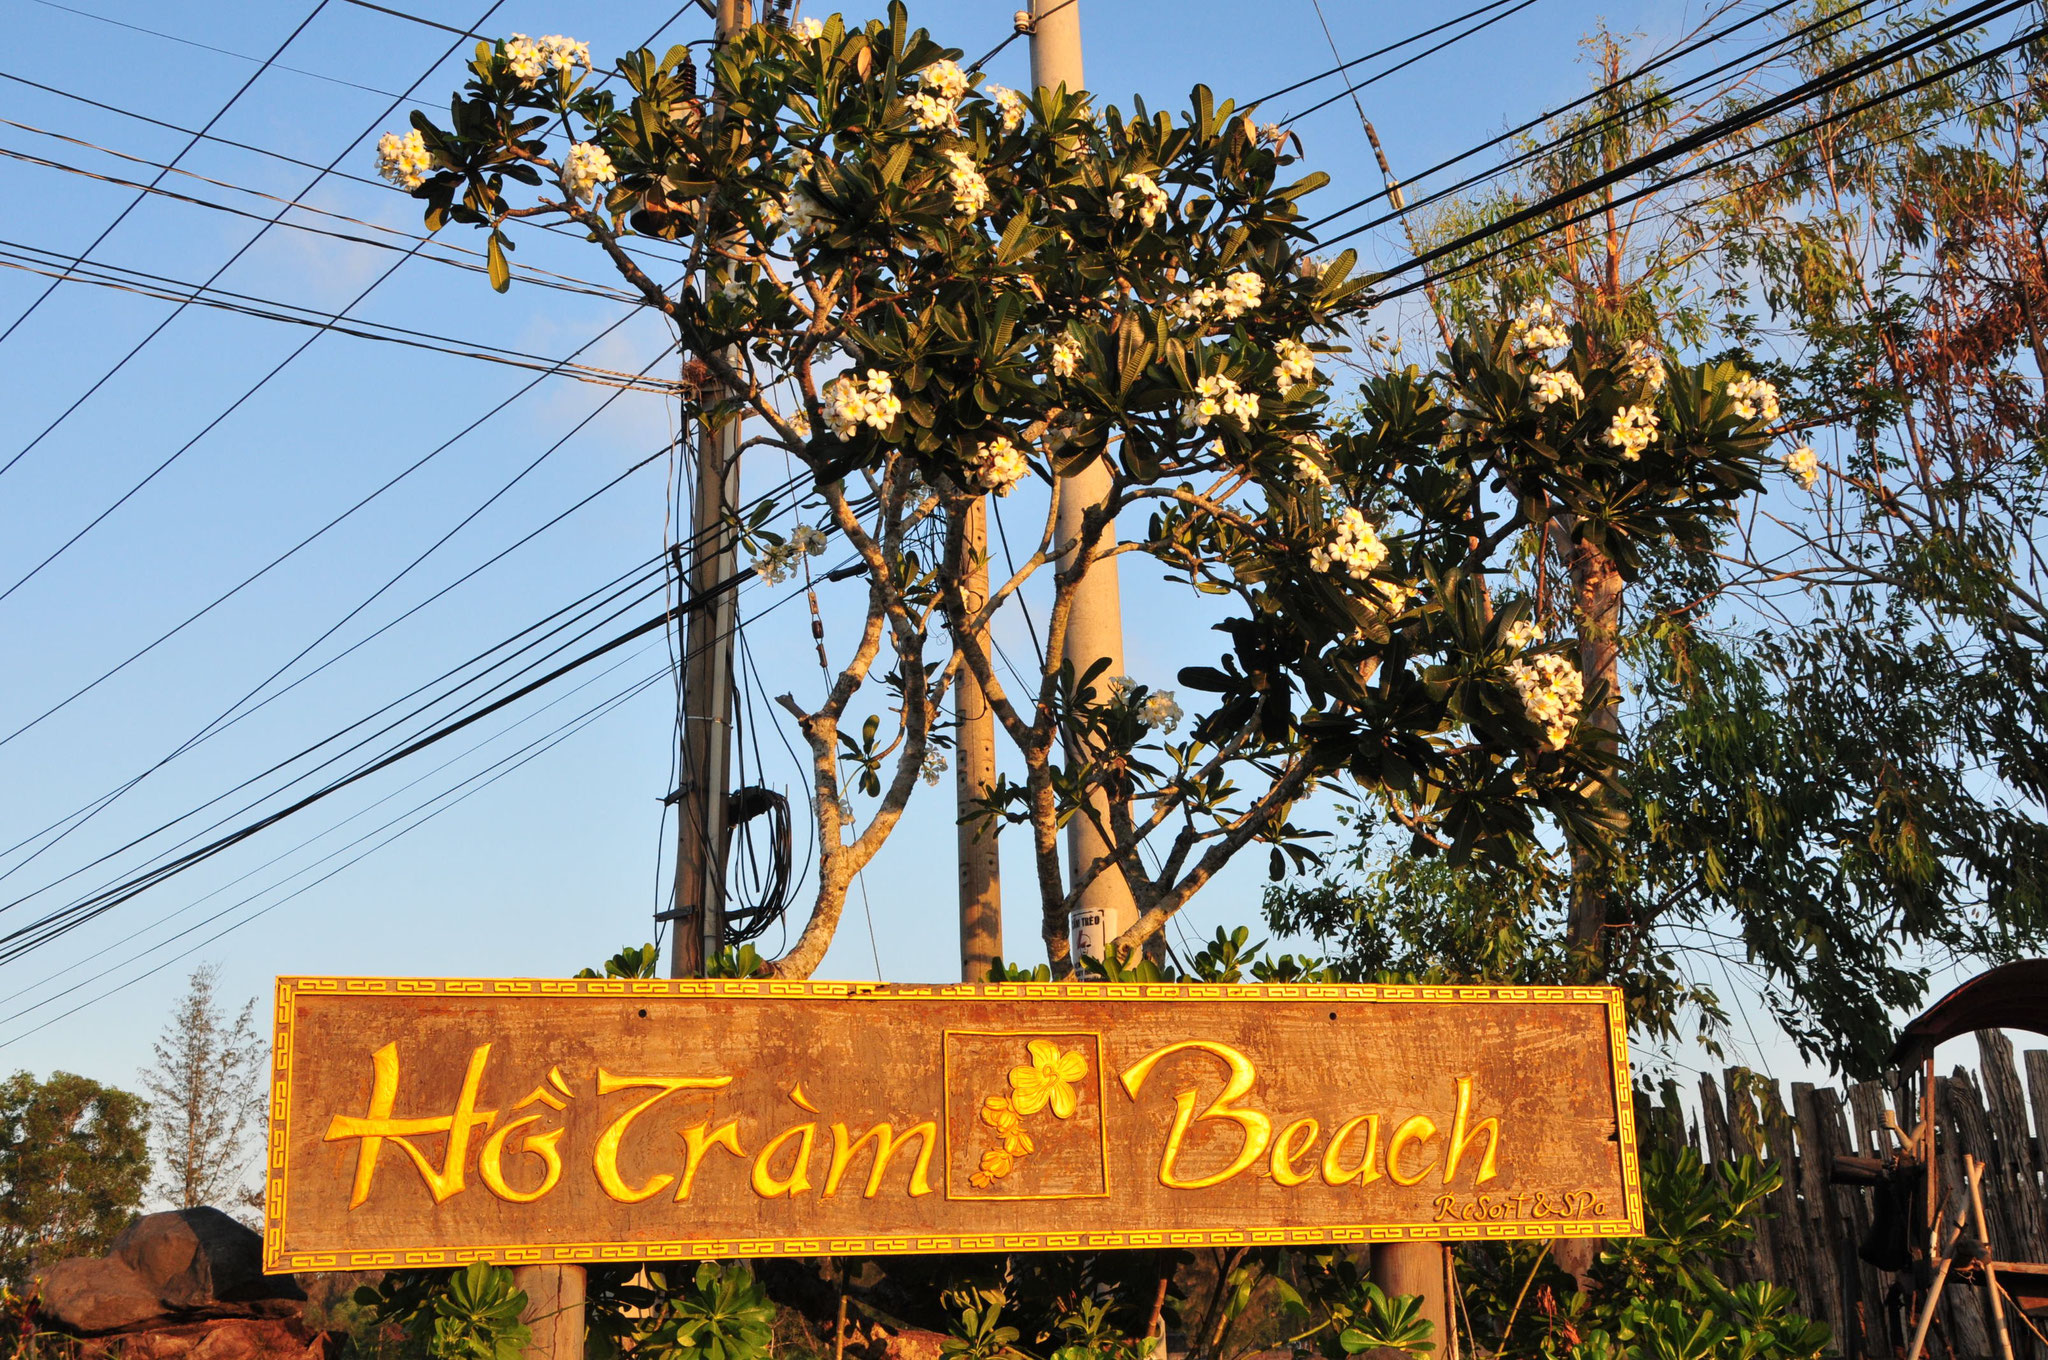 Ankunft in Ho Tram - unsere Strandwoche (Tag 20 - 28) startet hier